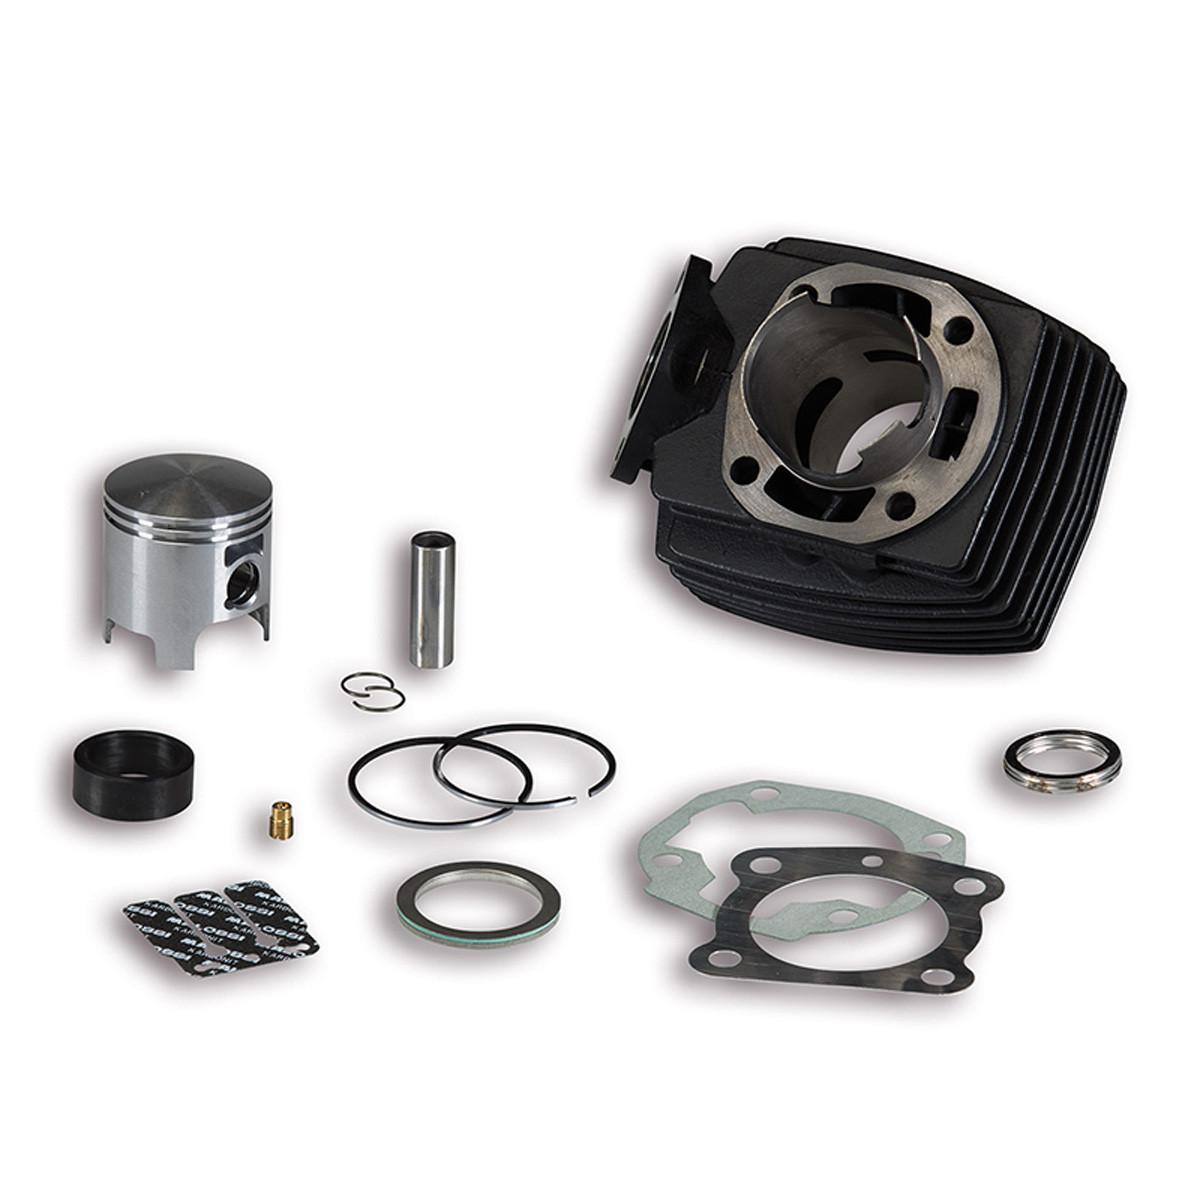 Kit Cylindre 70cc PEUGEOT 103 AC - Malossi Fonte